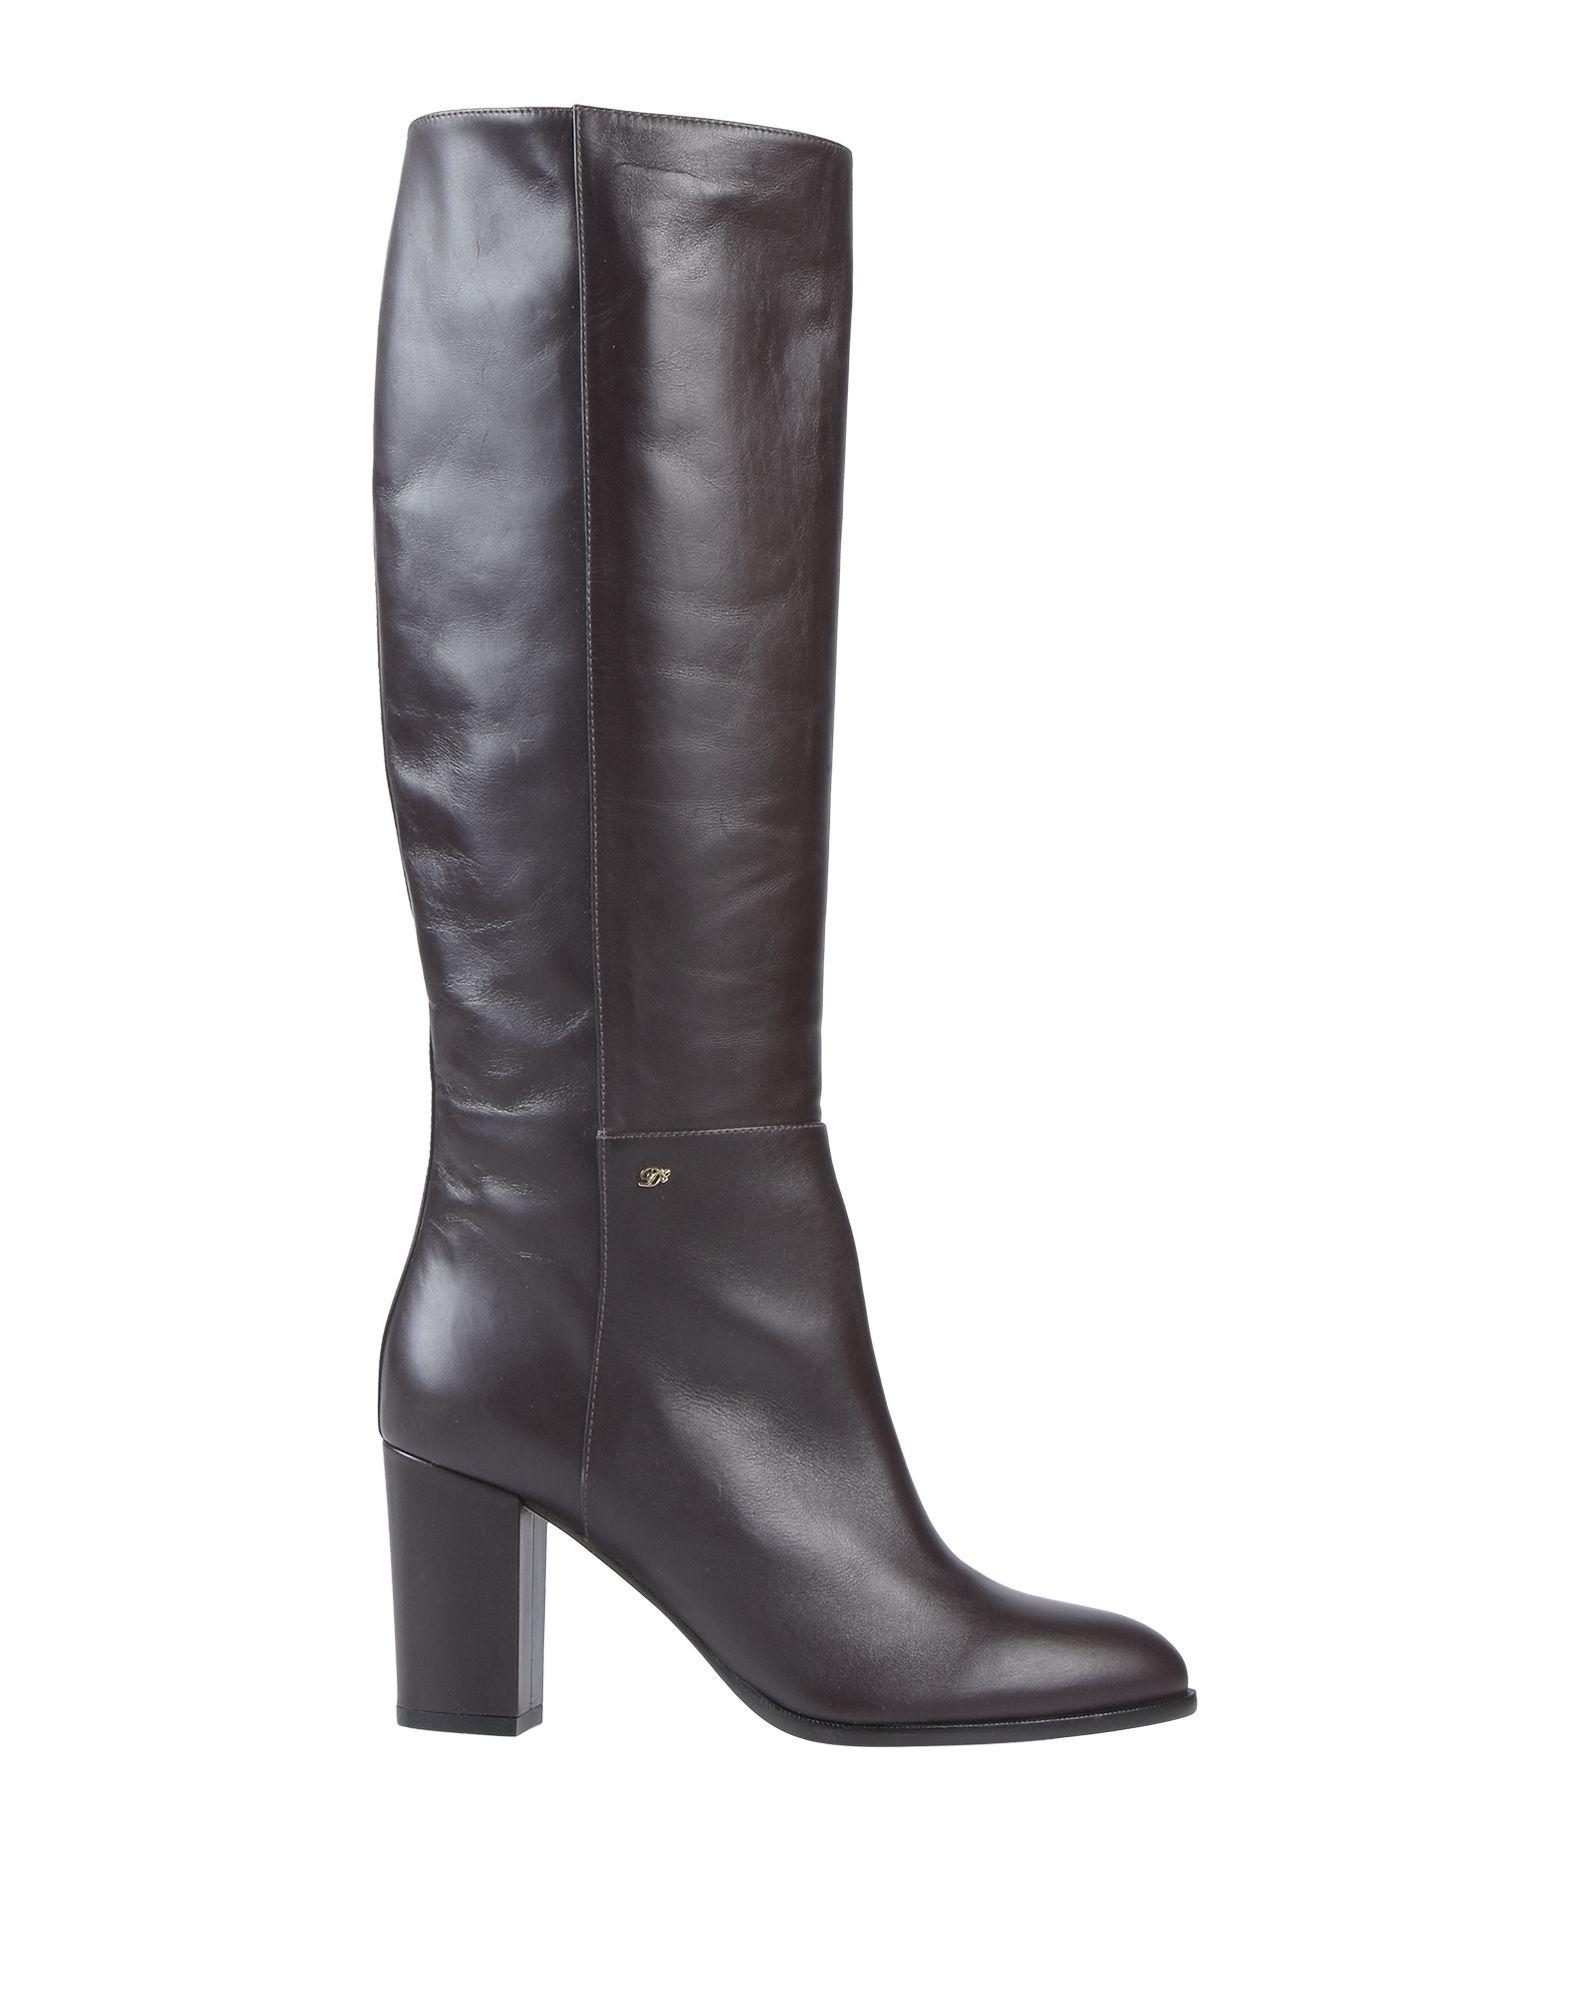 DSQUARED2 - Γυναικείες Μπότες  db9dc0e4de7